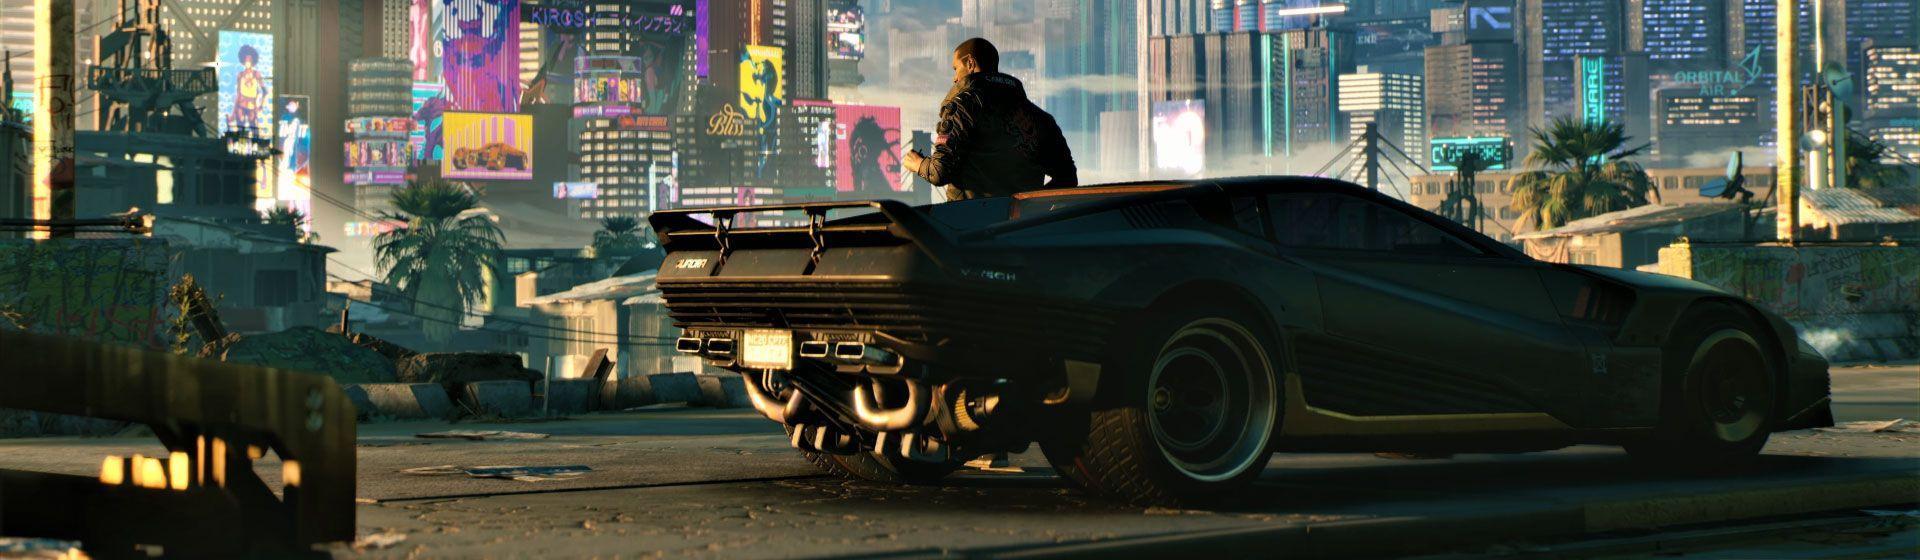 Cyberpunk 2077: veja primeira gameplay no Xbox Series X e One X